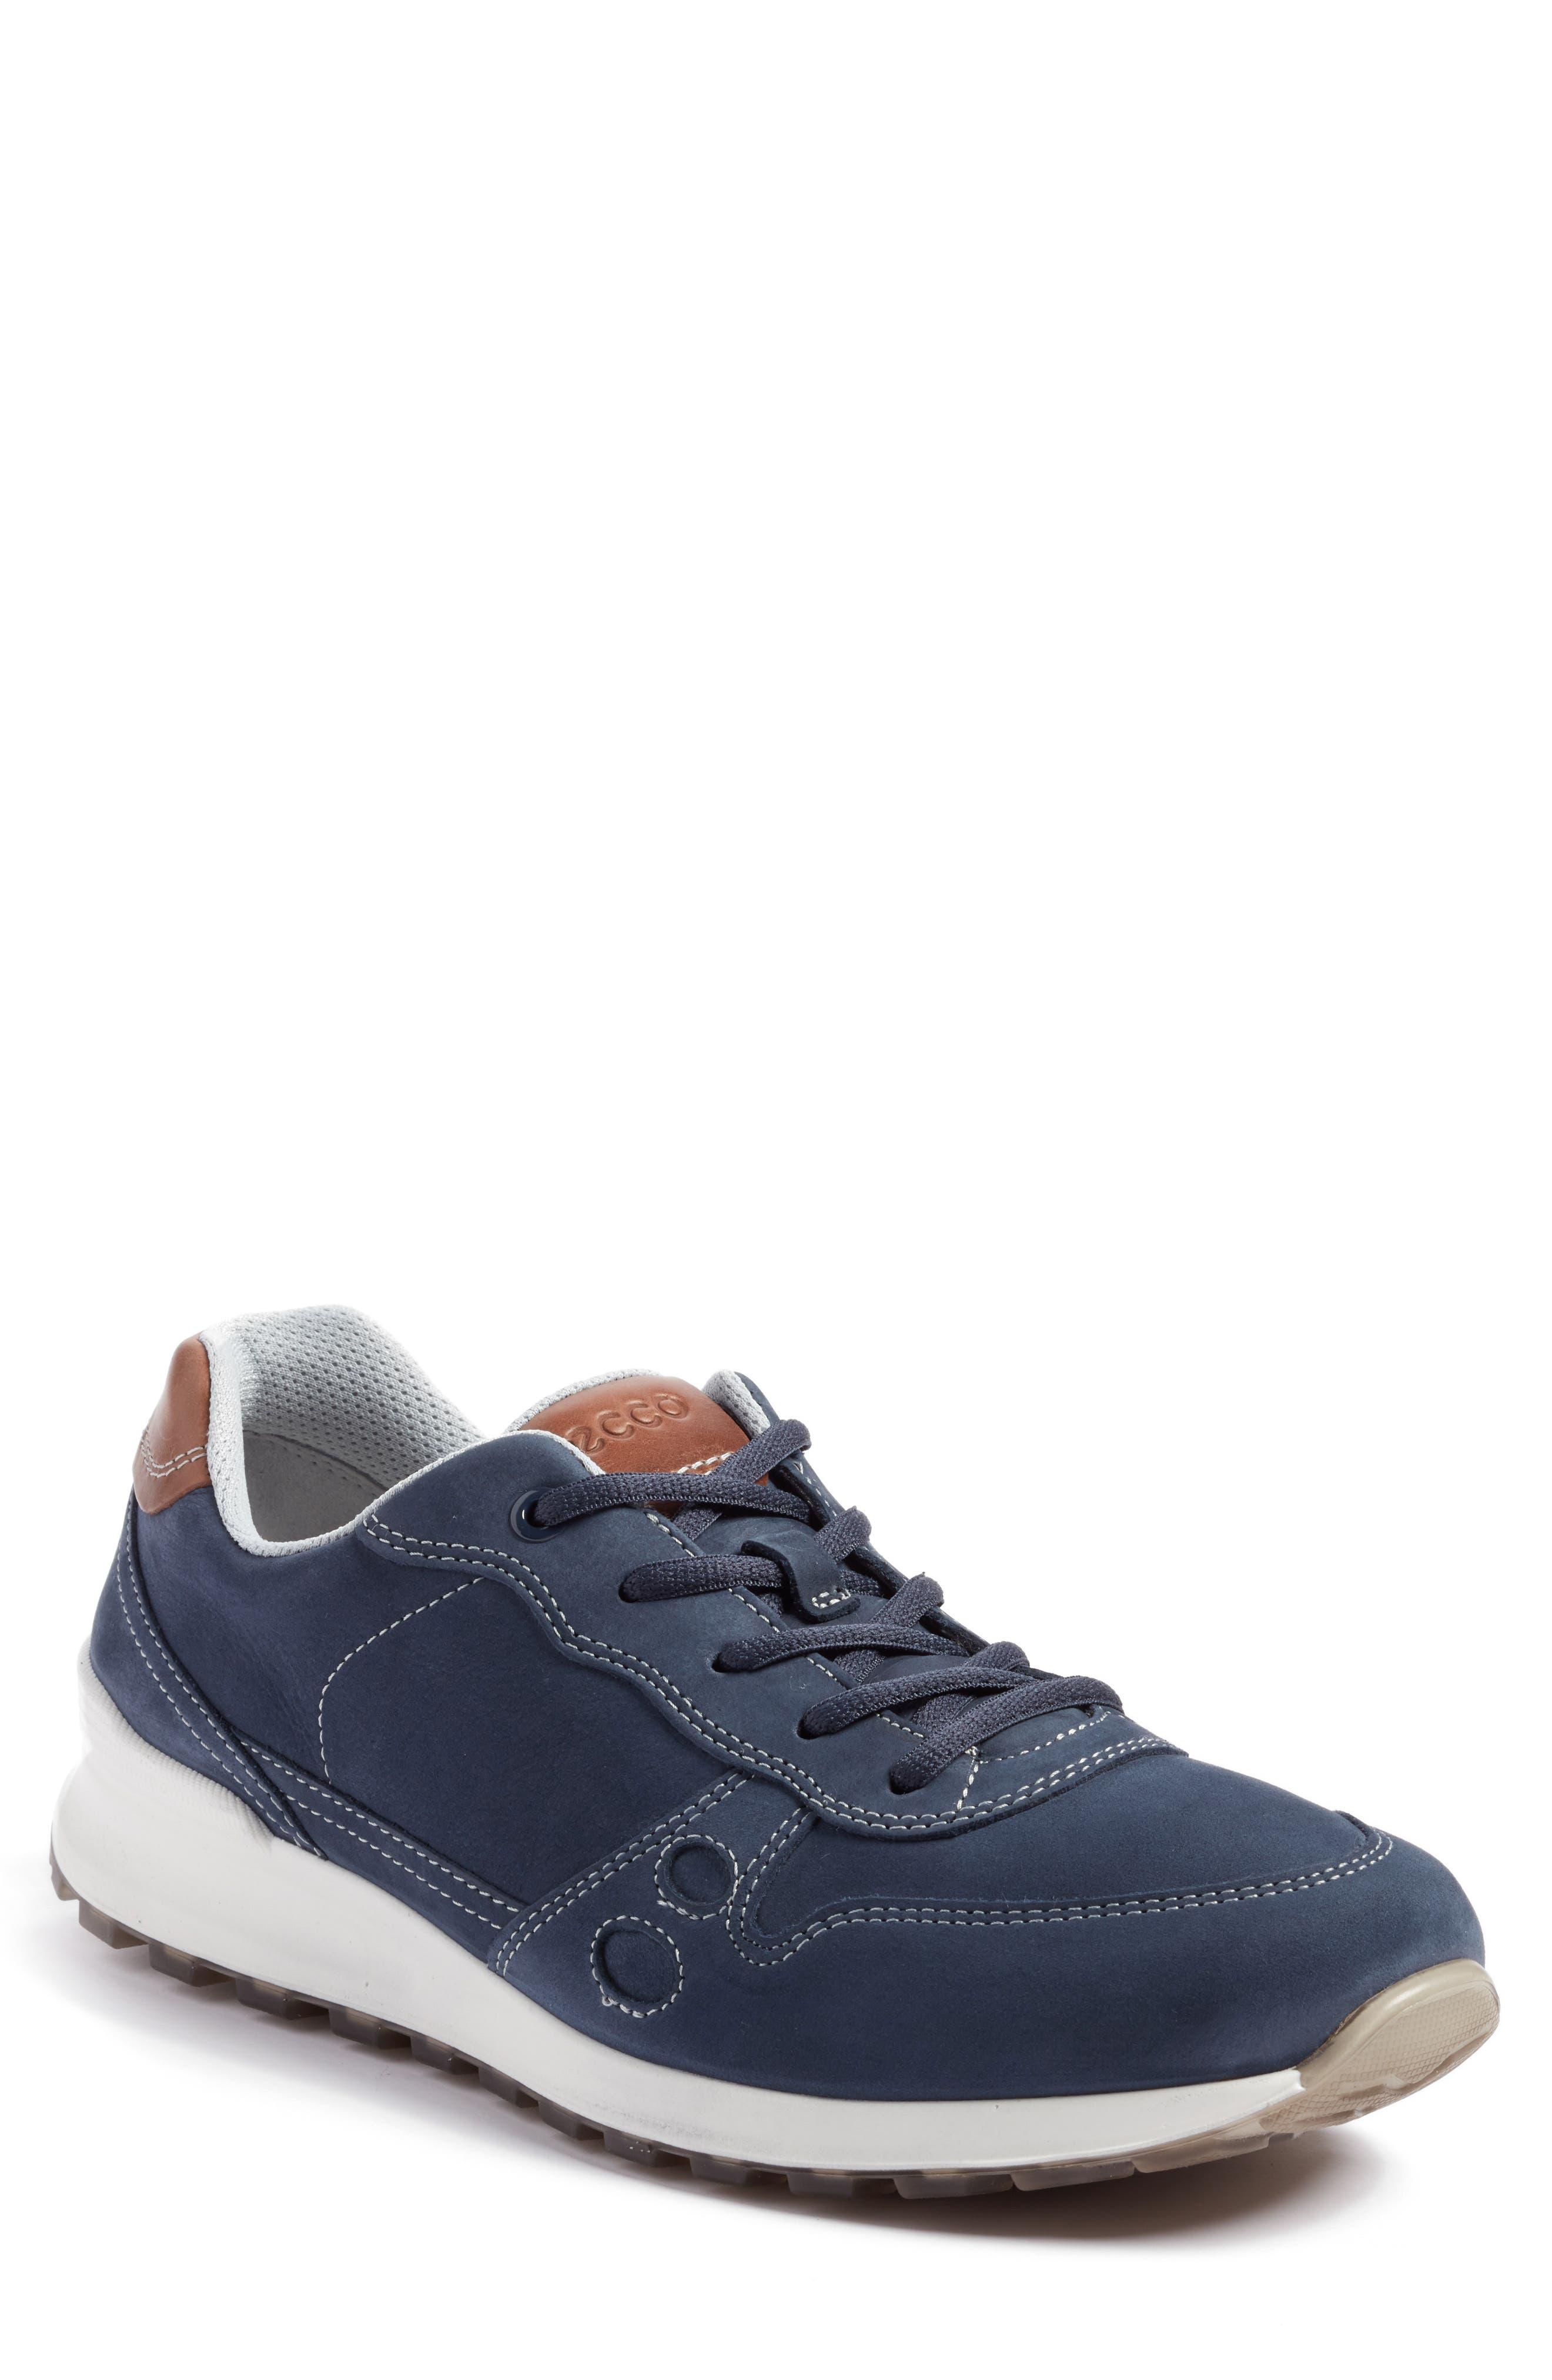 CS14 Retro Sneaker,                         Main,                         color,